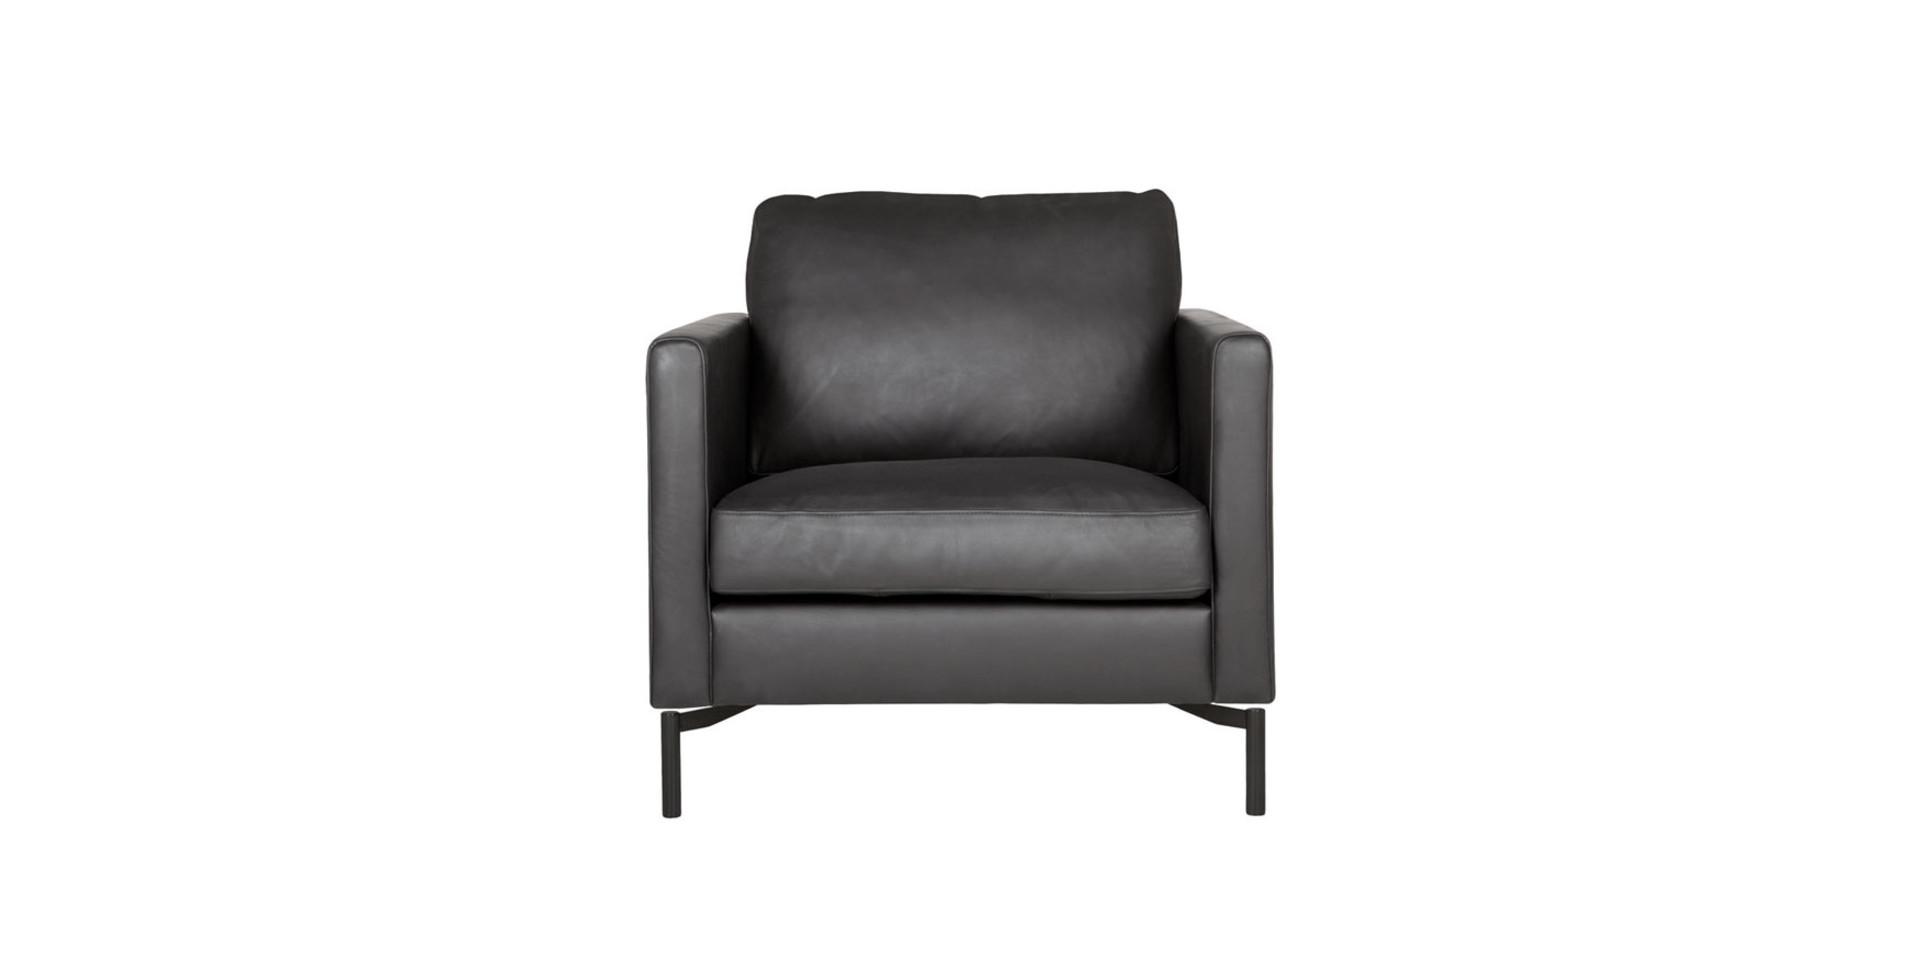 sits-impulse-fauteuil-aniline-black-pieds-145-metal